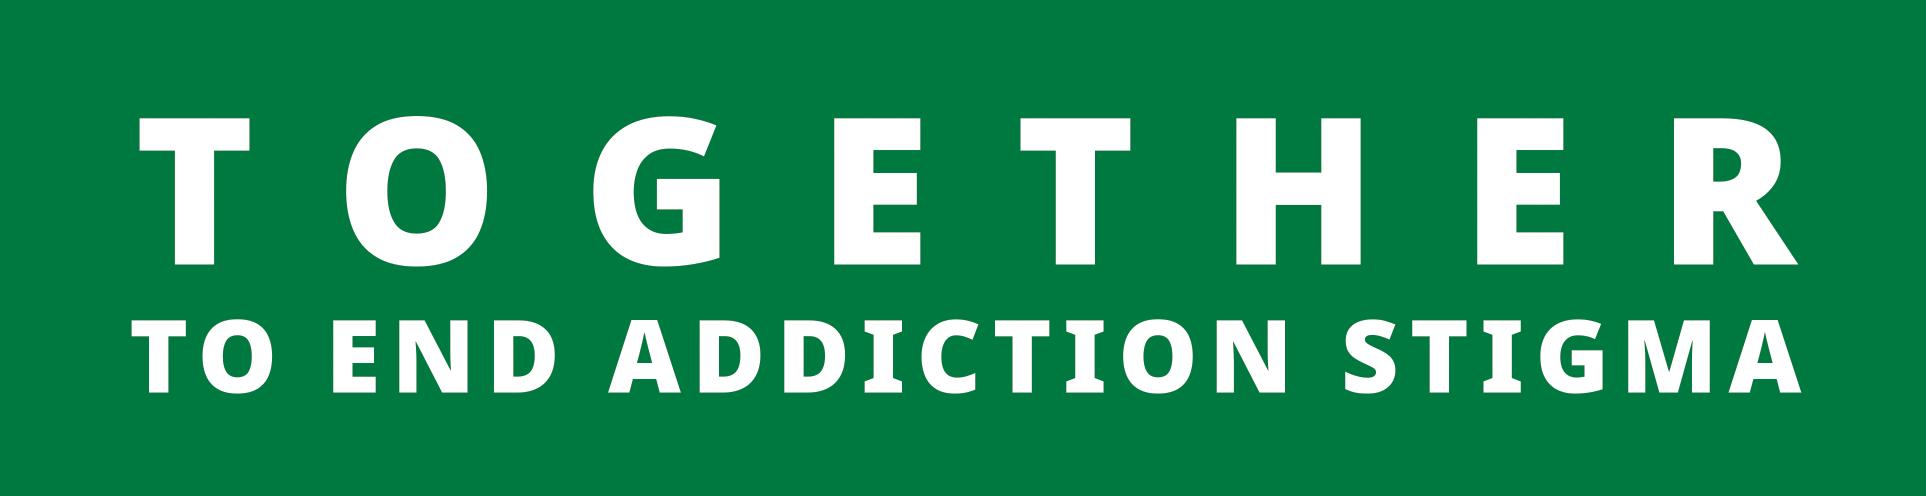 End Addiction Stigma Logo